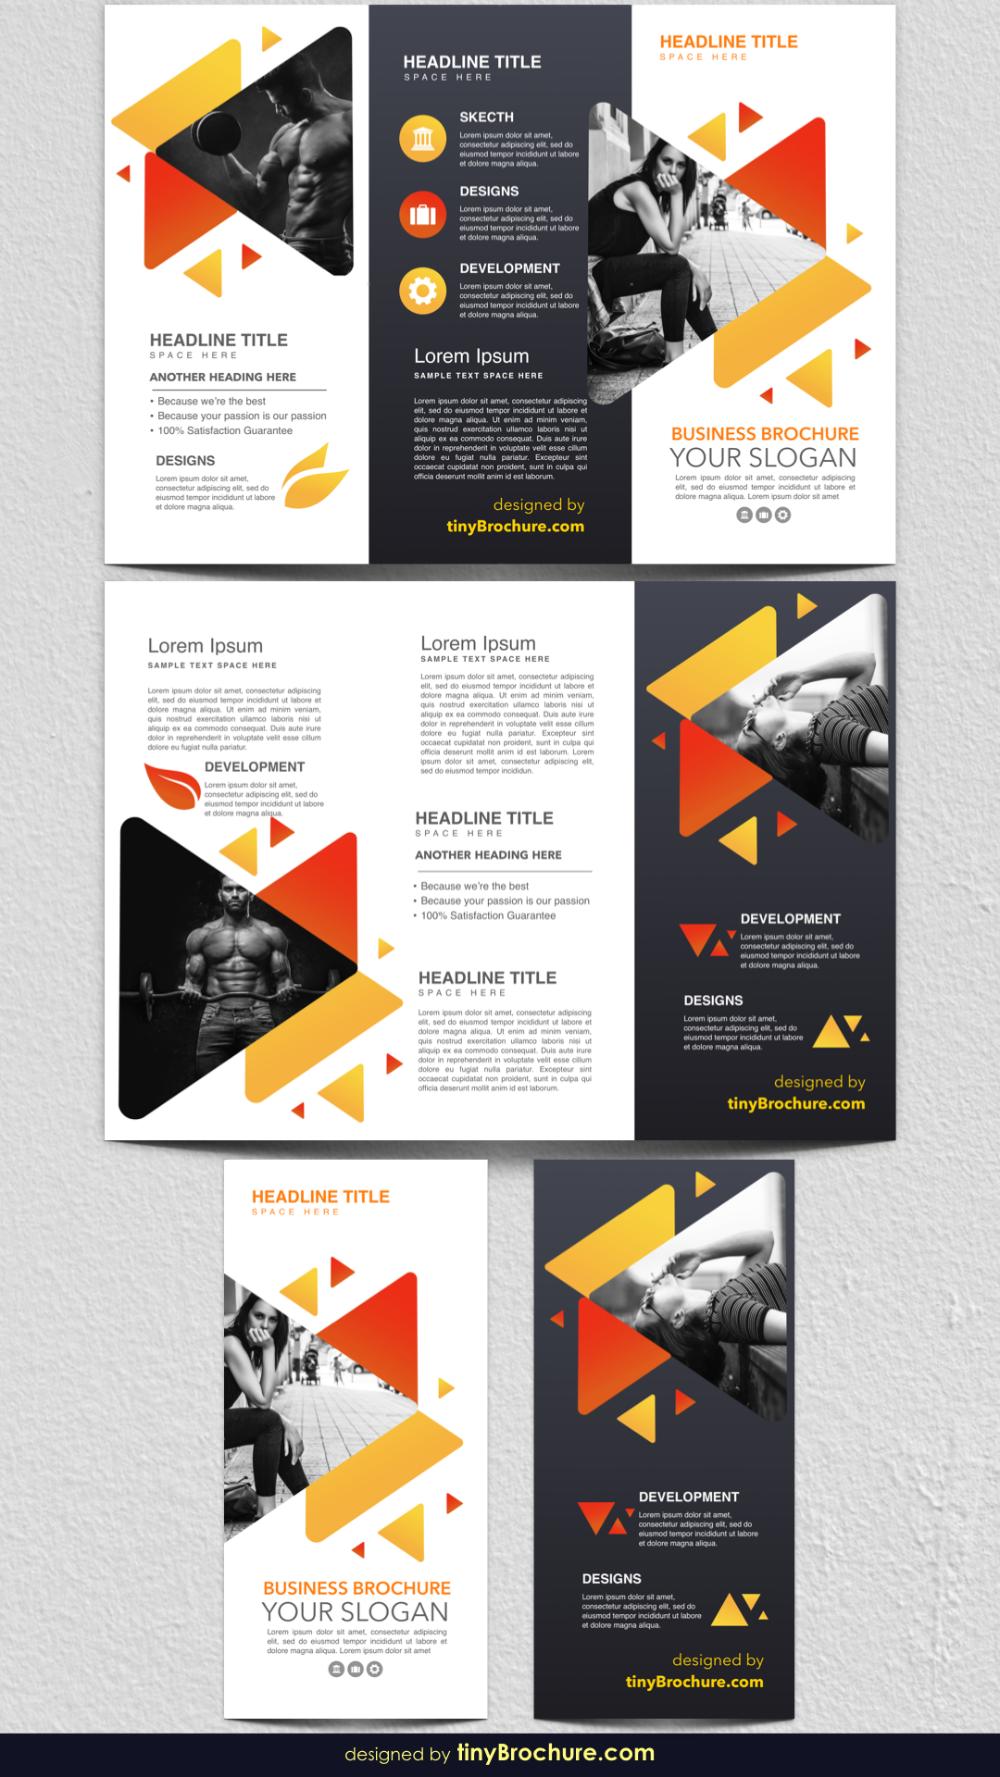 3 Panel Brochure Template Google Docs 2019 Rack Card Designs For Google Docs Travel Brochure In 2020 Brochure Design Template Brochure Design Layout Brochure Design